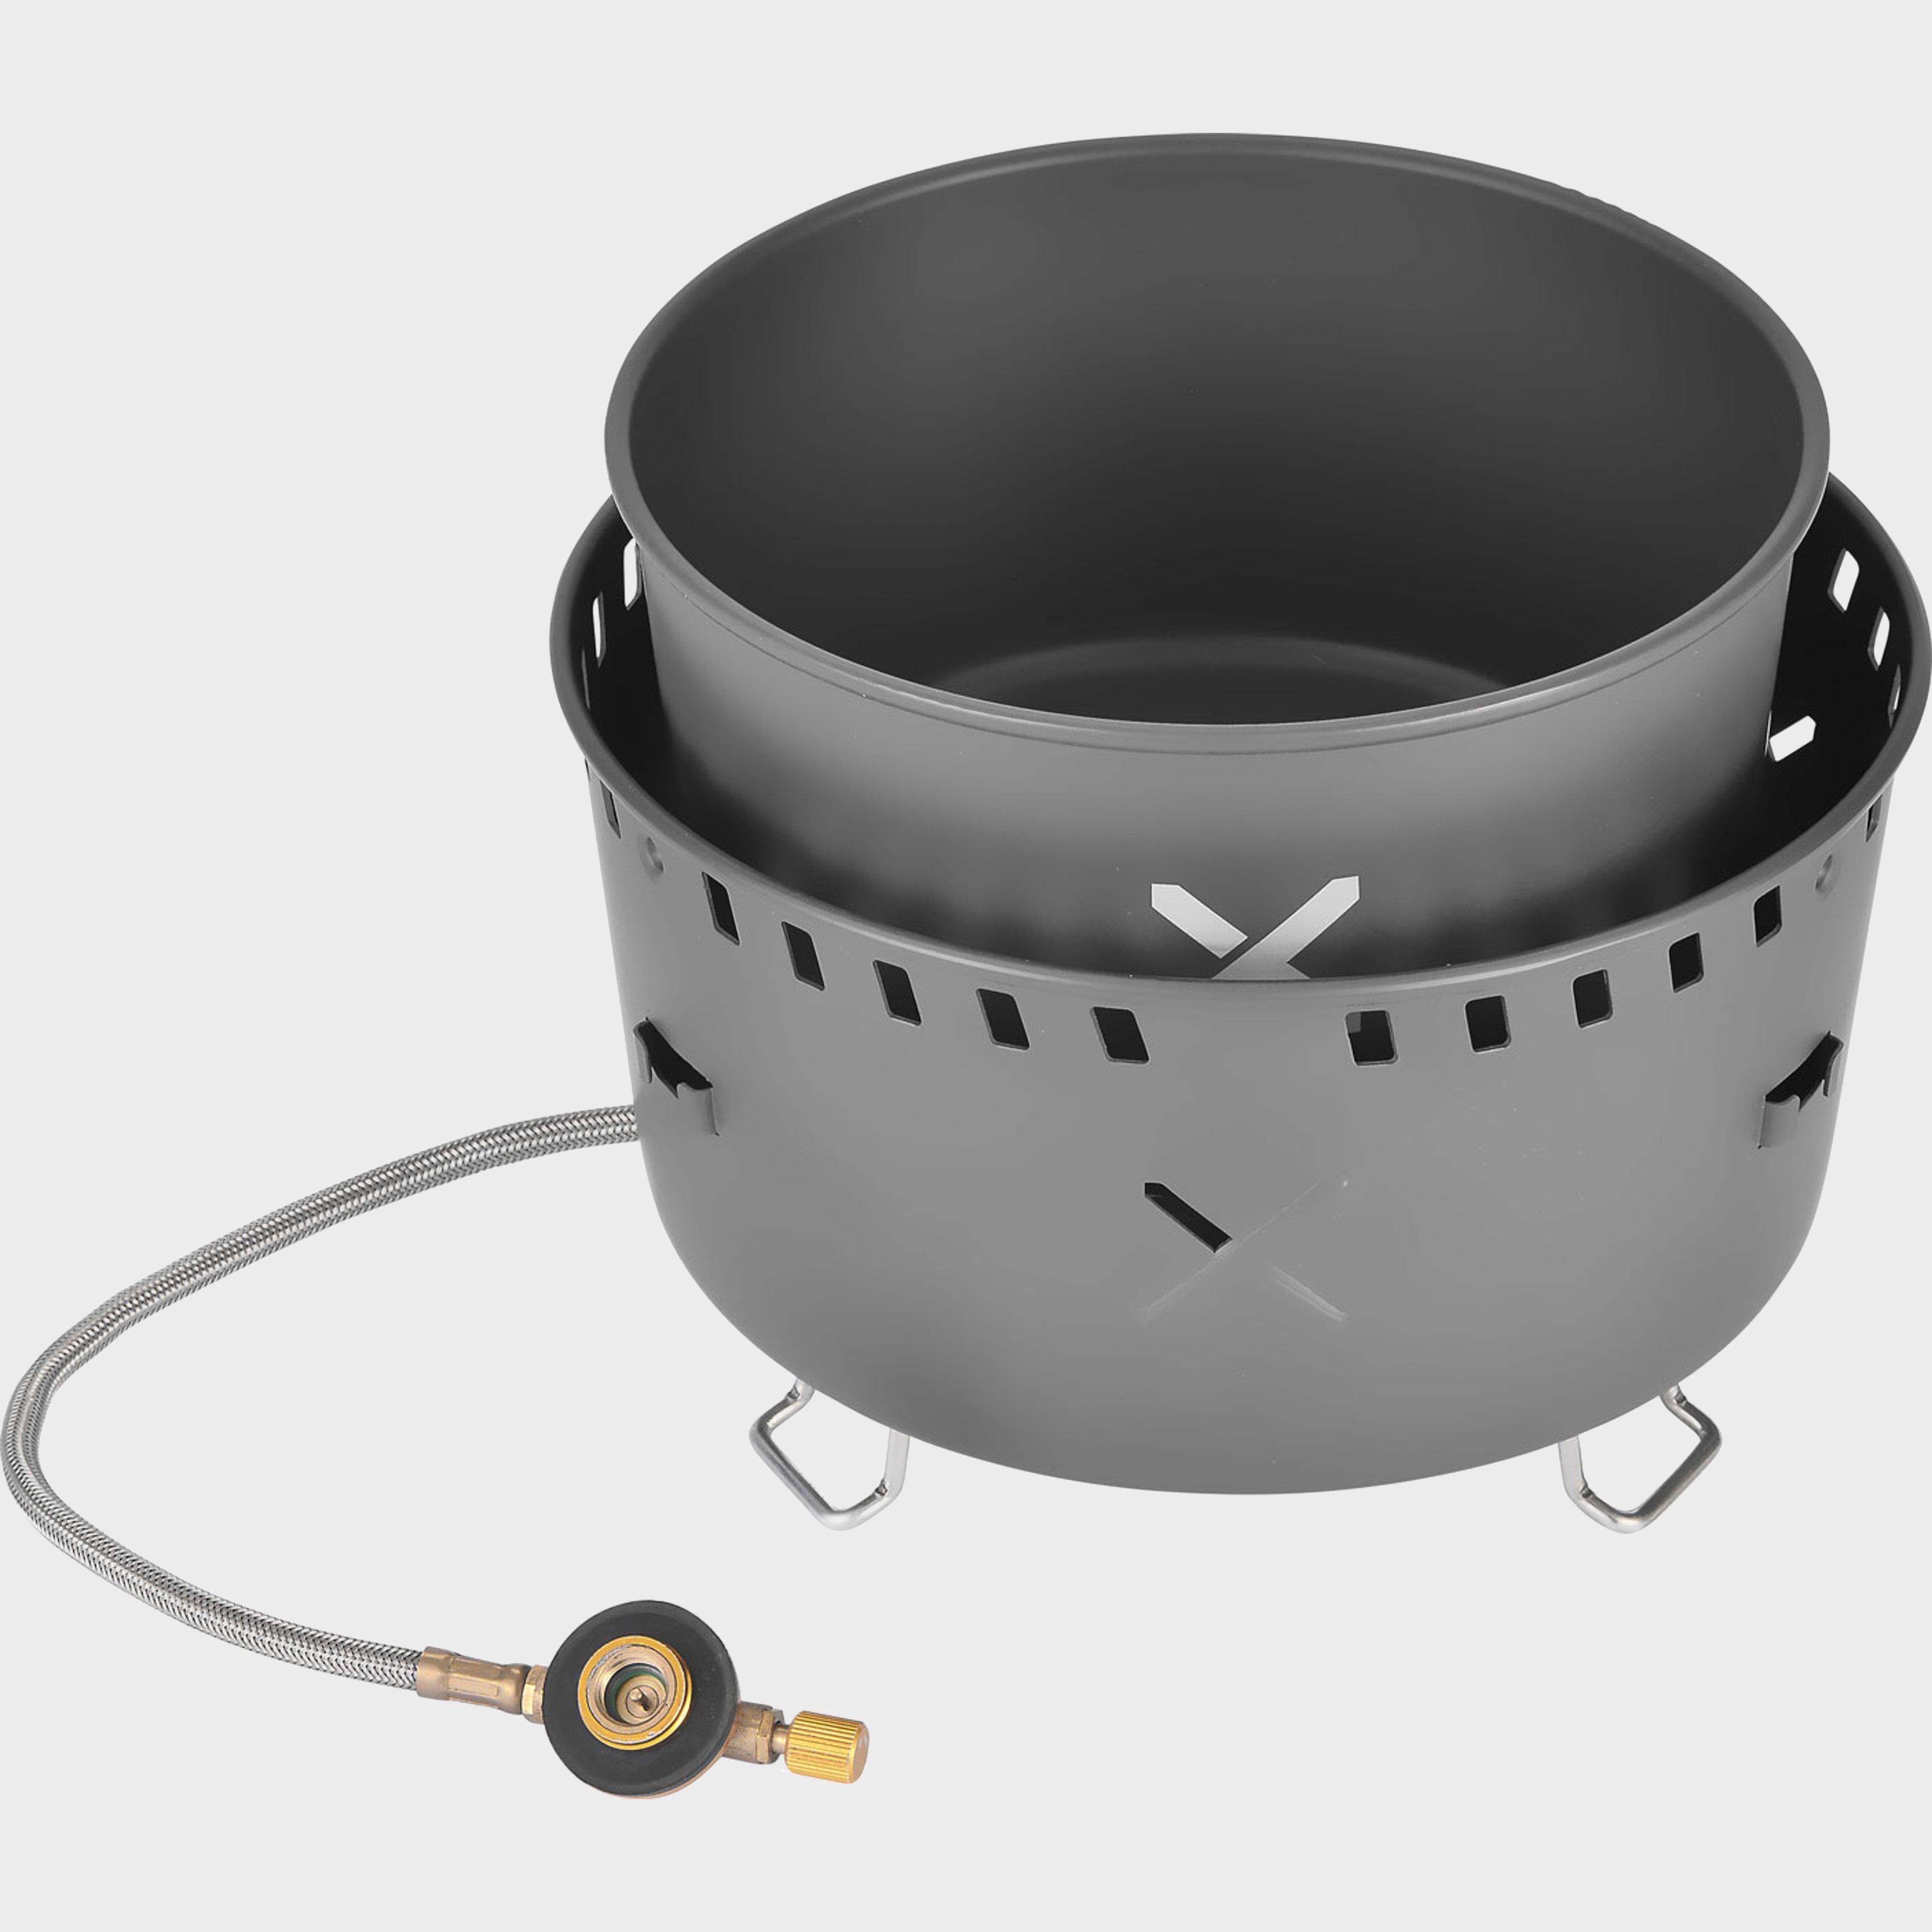 Oex Oex Meru Basecamp Gas Cooking System - Grey, Grey